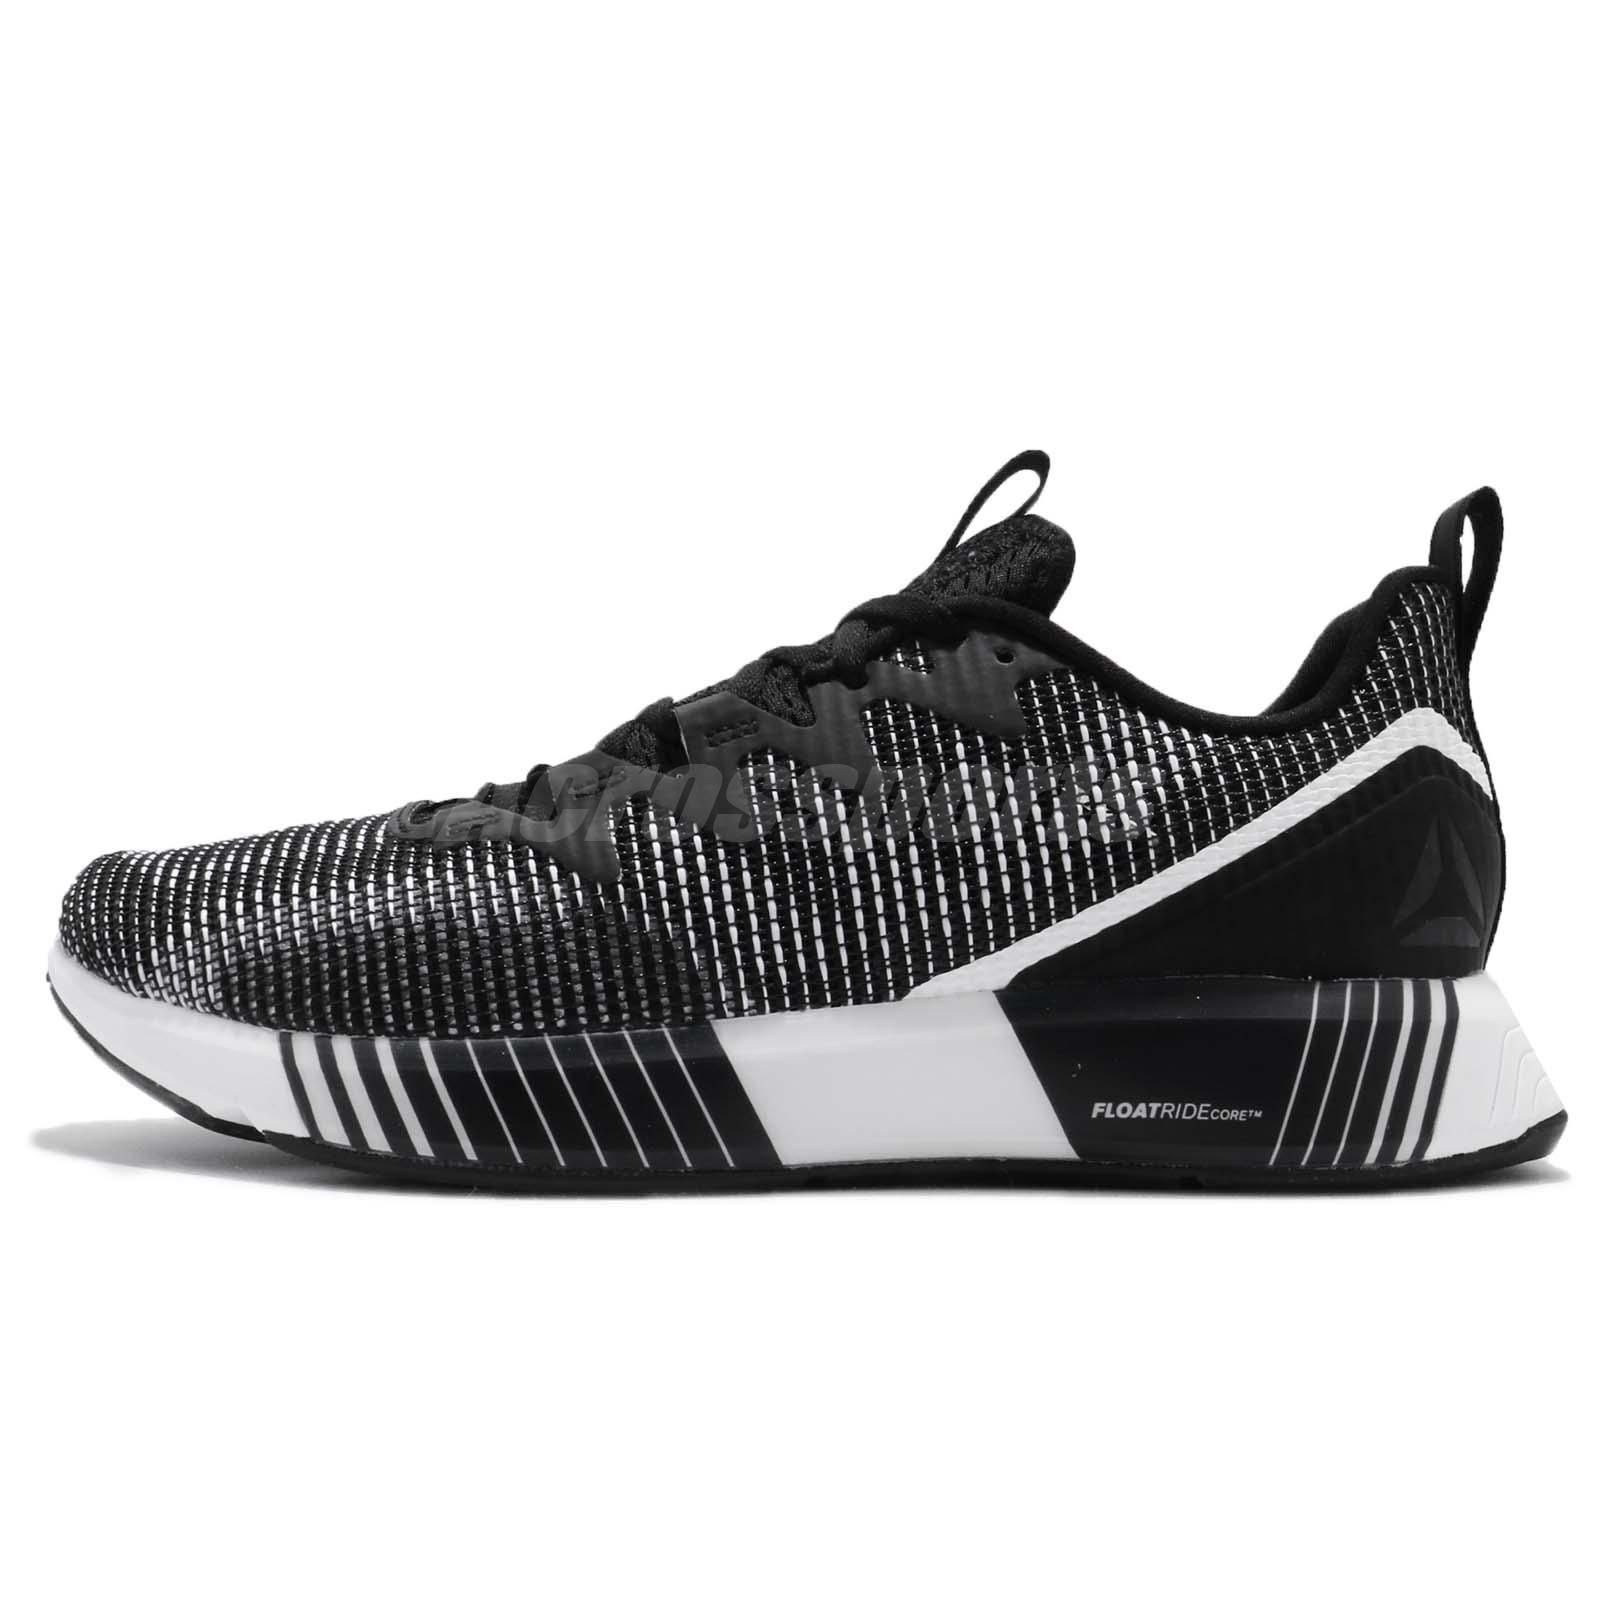 adf0a2d6af2 Reebok Fusion Flexweave Floatride Black White Men Running Shoes Sneakers  CN2424